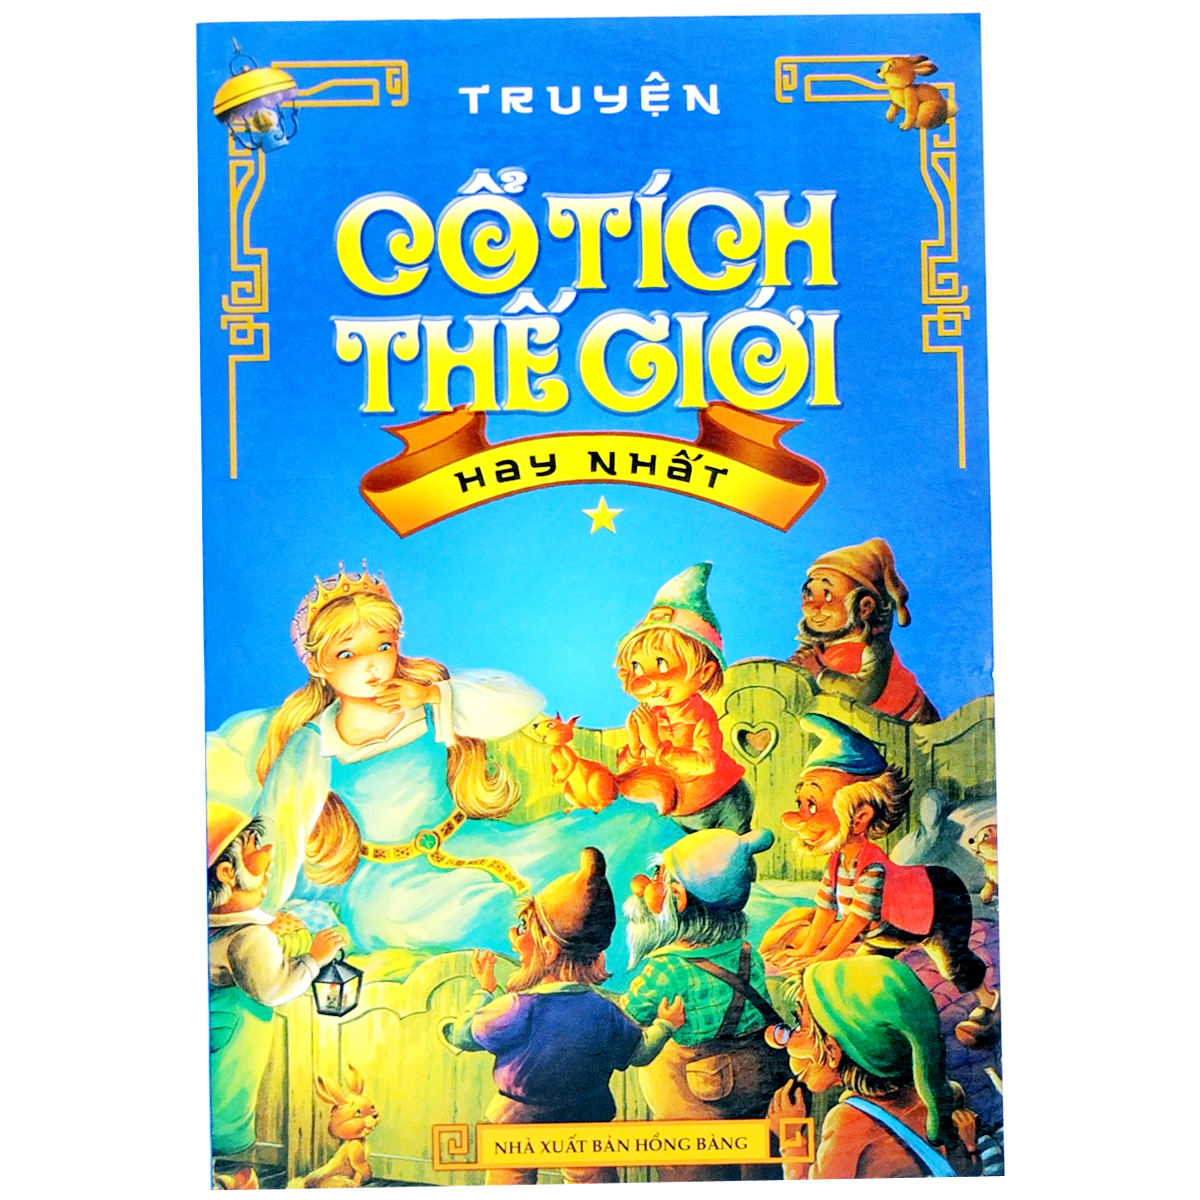 Truyen co tich the gioi hay nhat-Tap 1